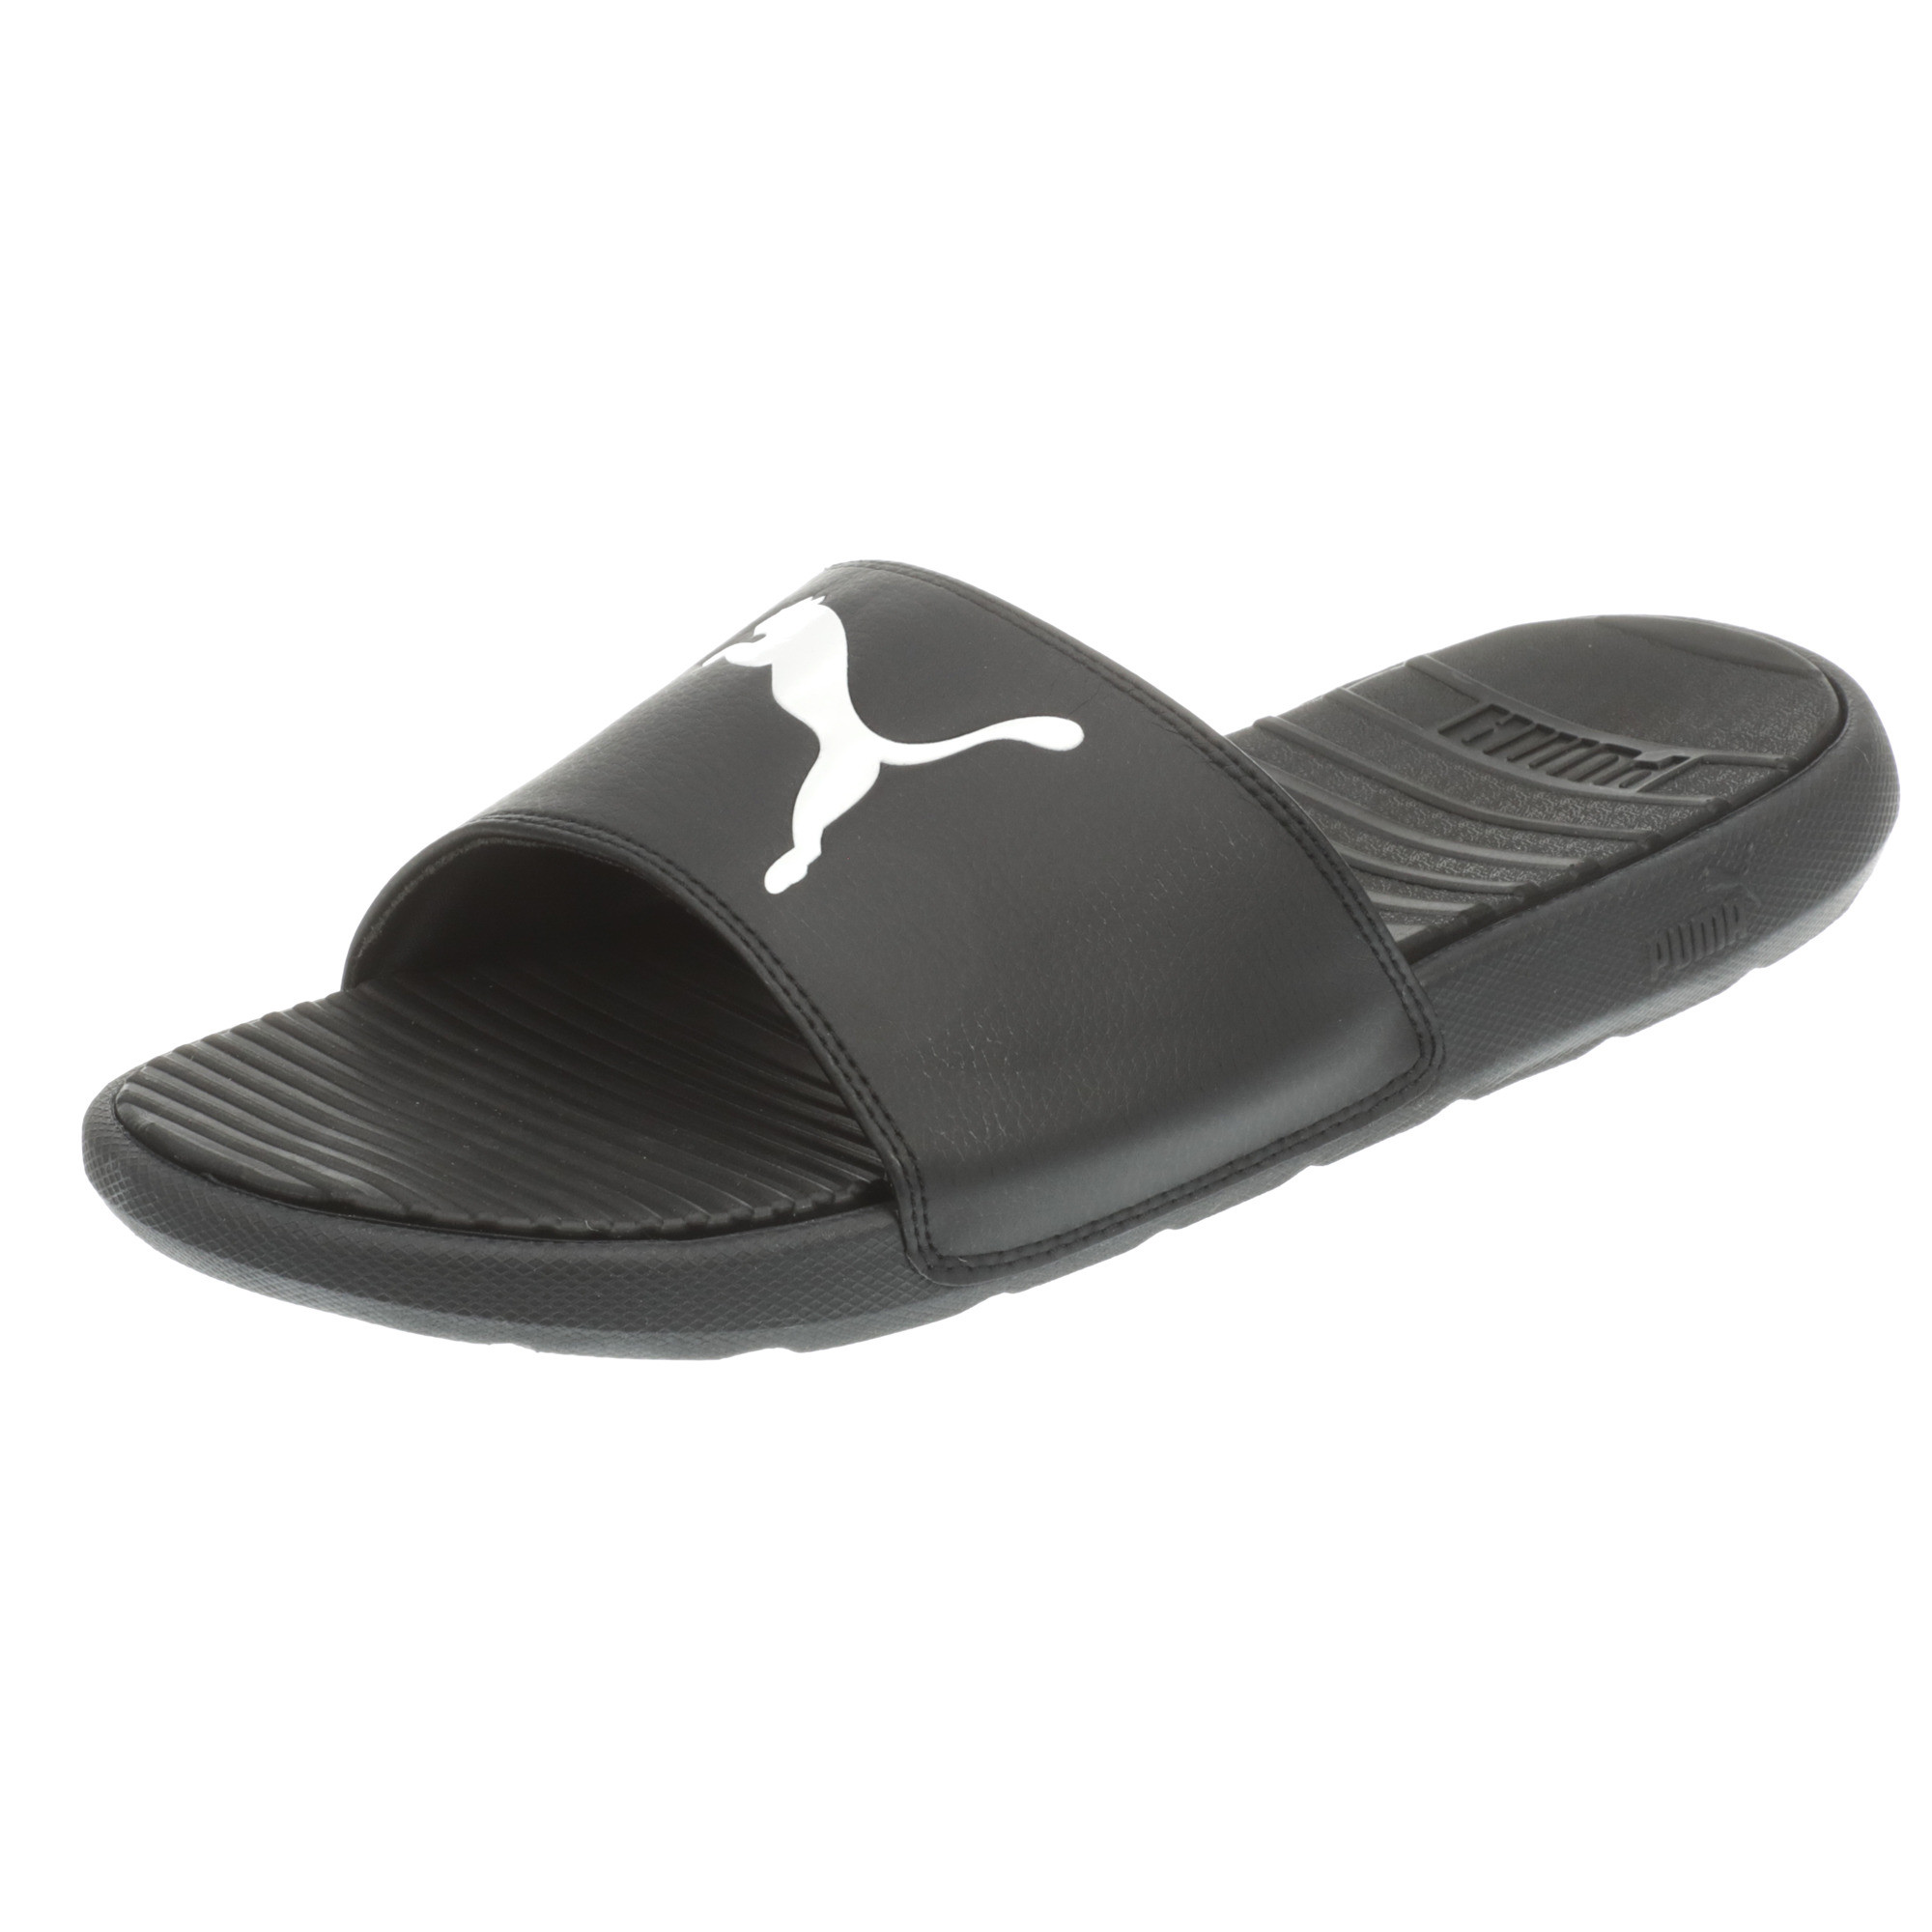 PUMA-Cool-Cat-Sport-Men-039-s-Slides-Men-Sandal-Swimming-Beach thumbnail 4